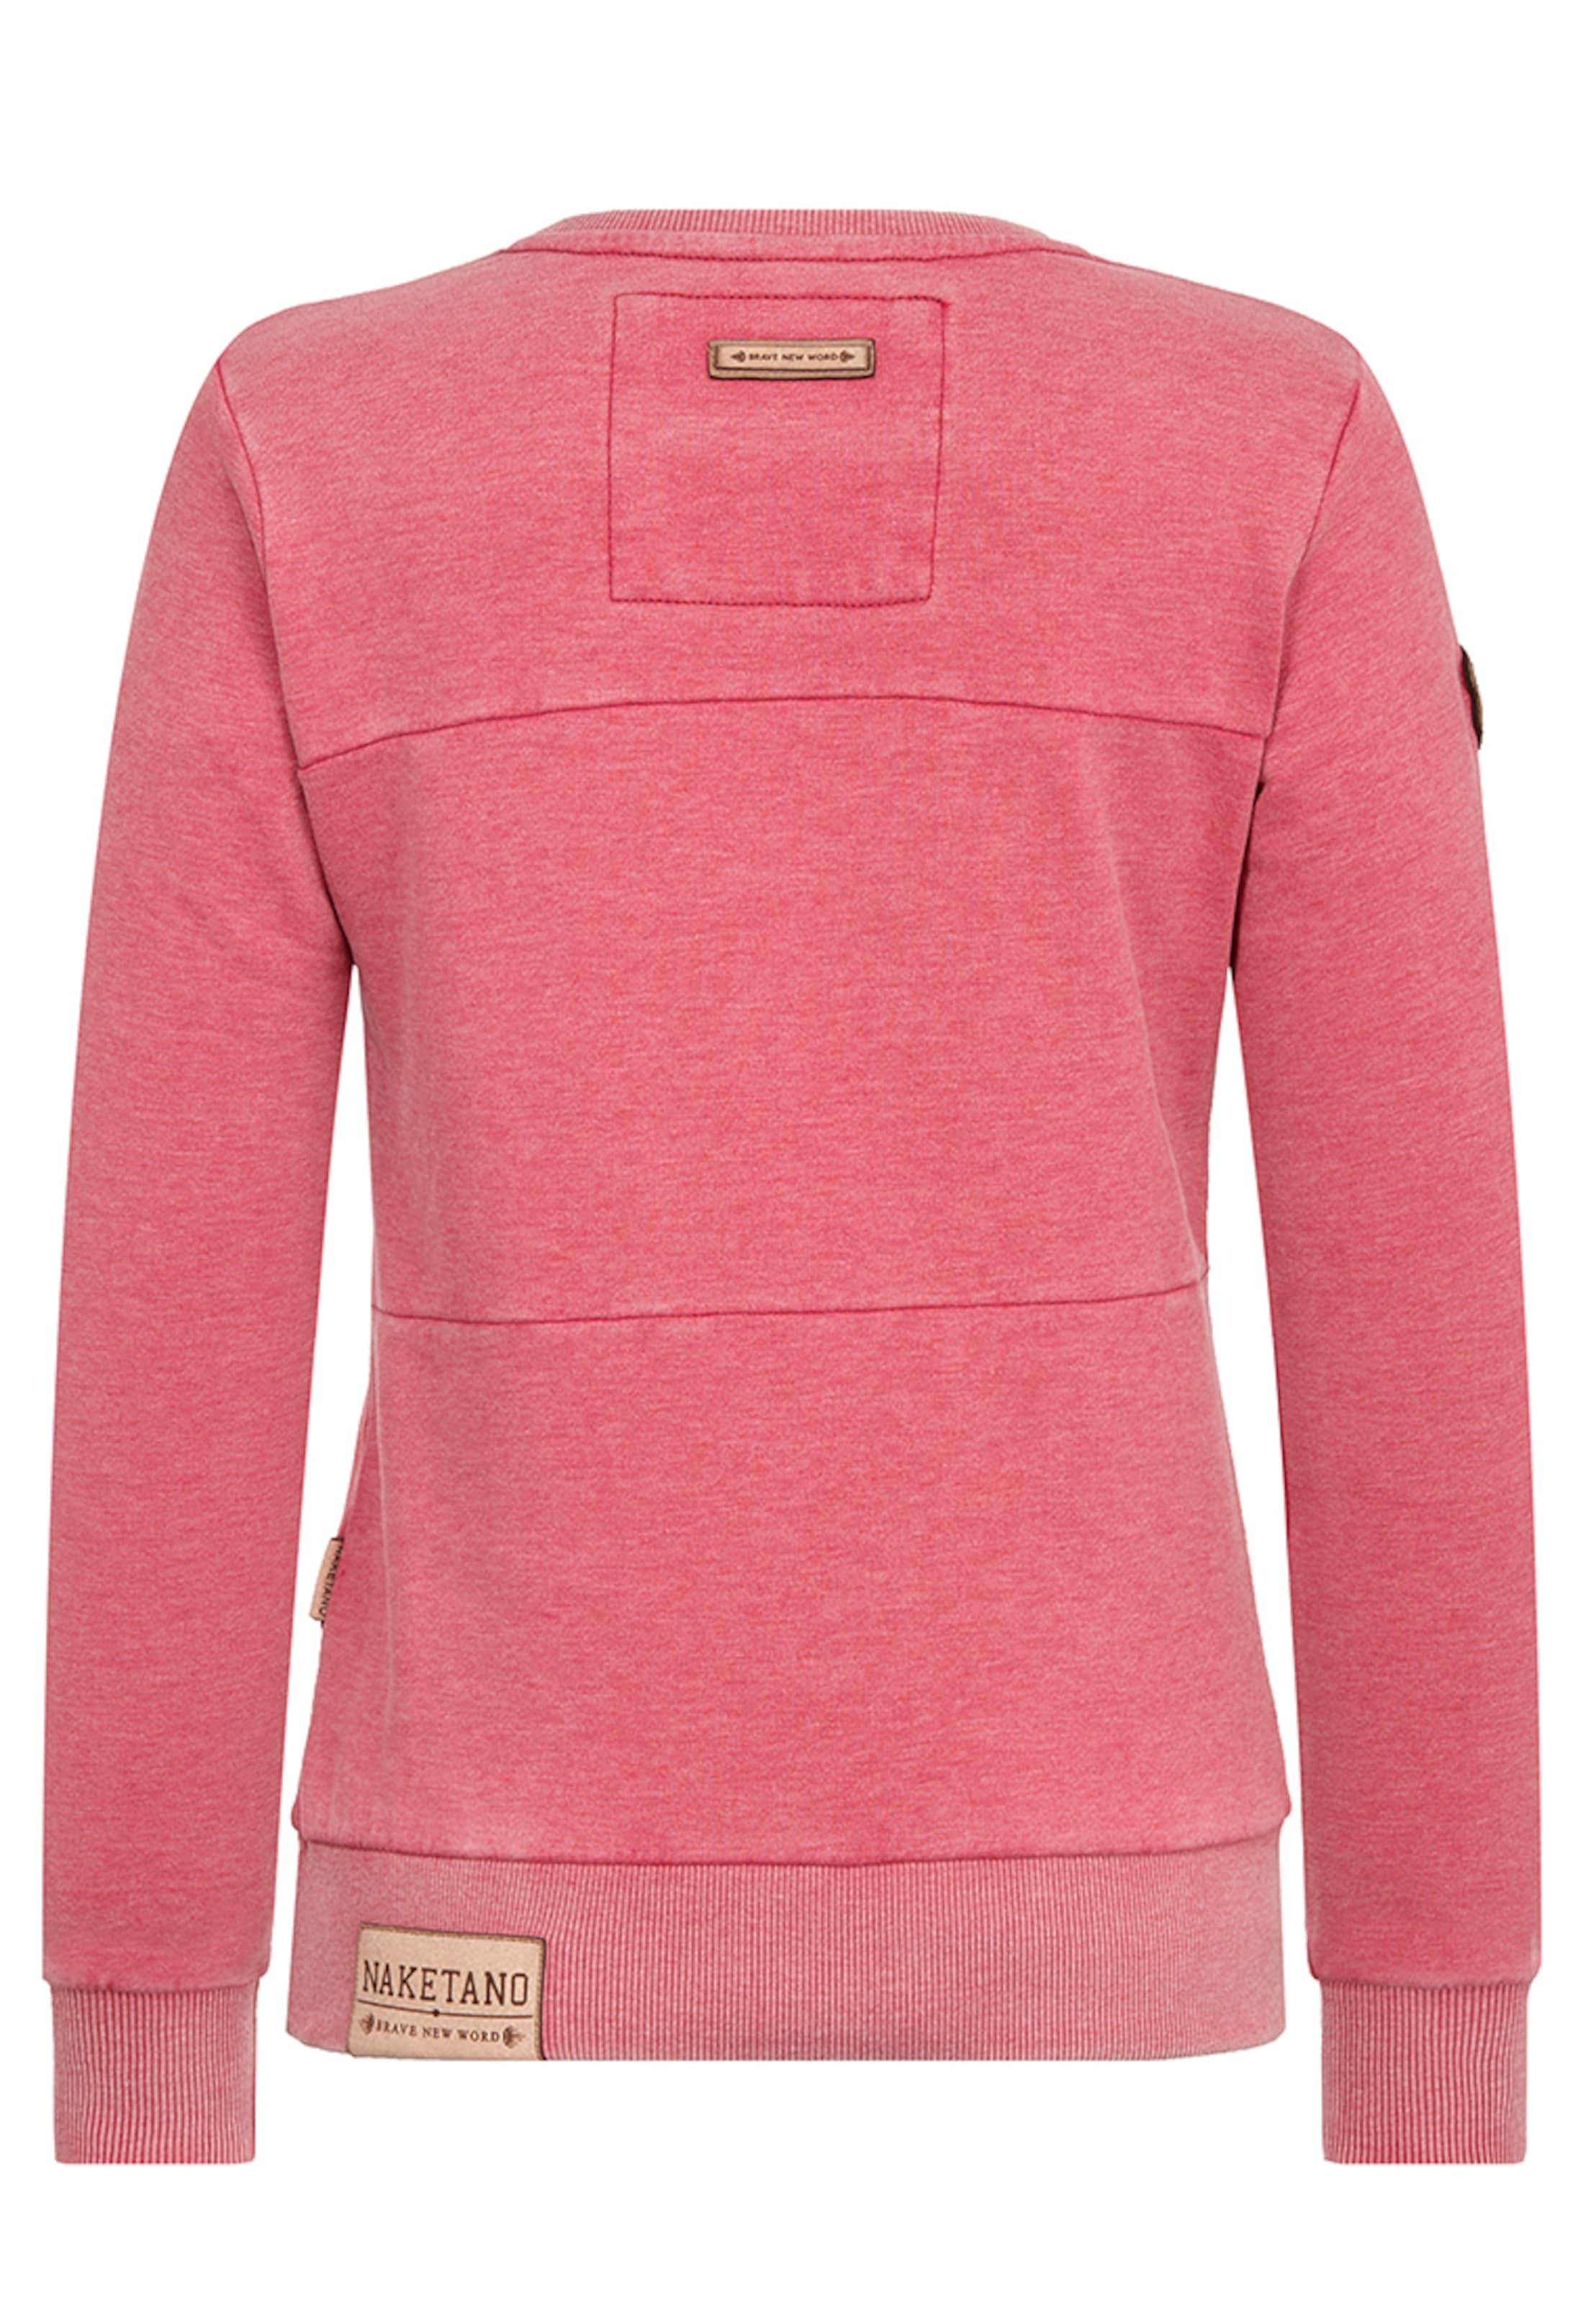 Naketano En Sweat shirt Rose 'daisy' Chiné CQoeEdxWrB